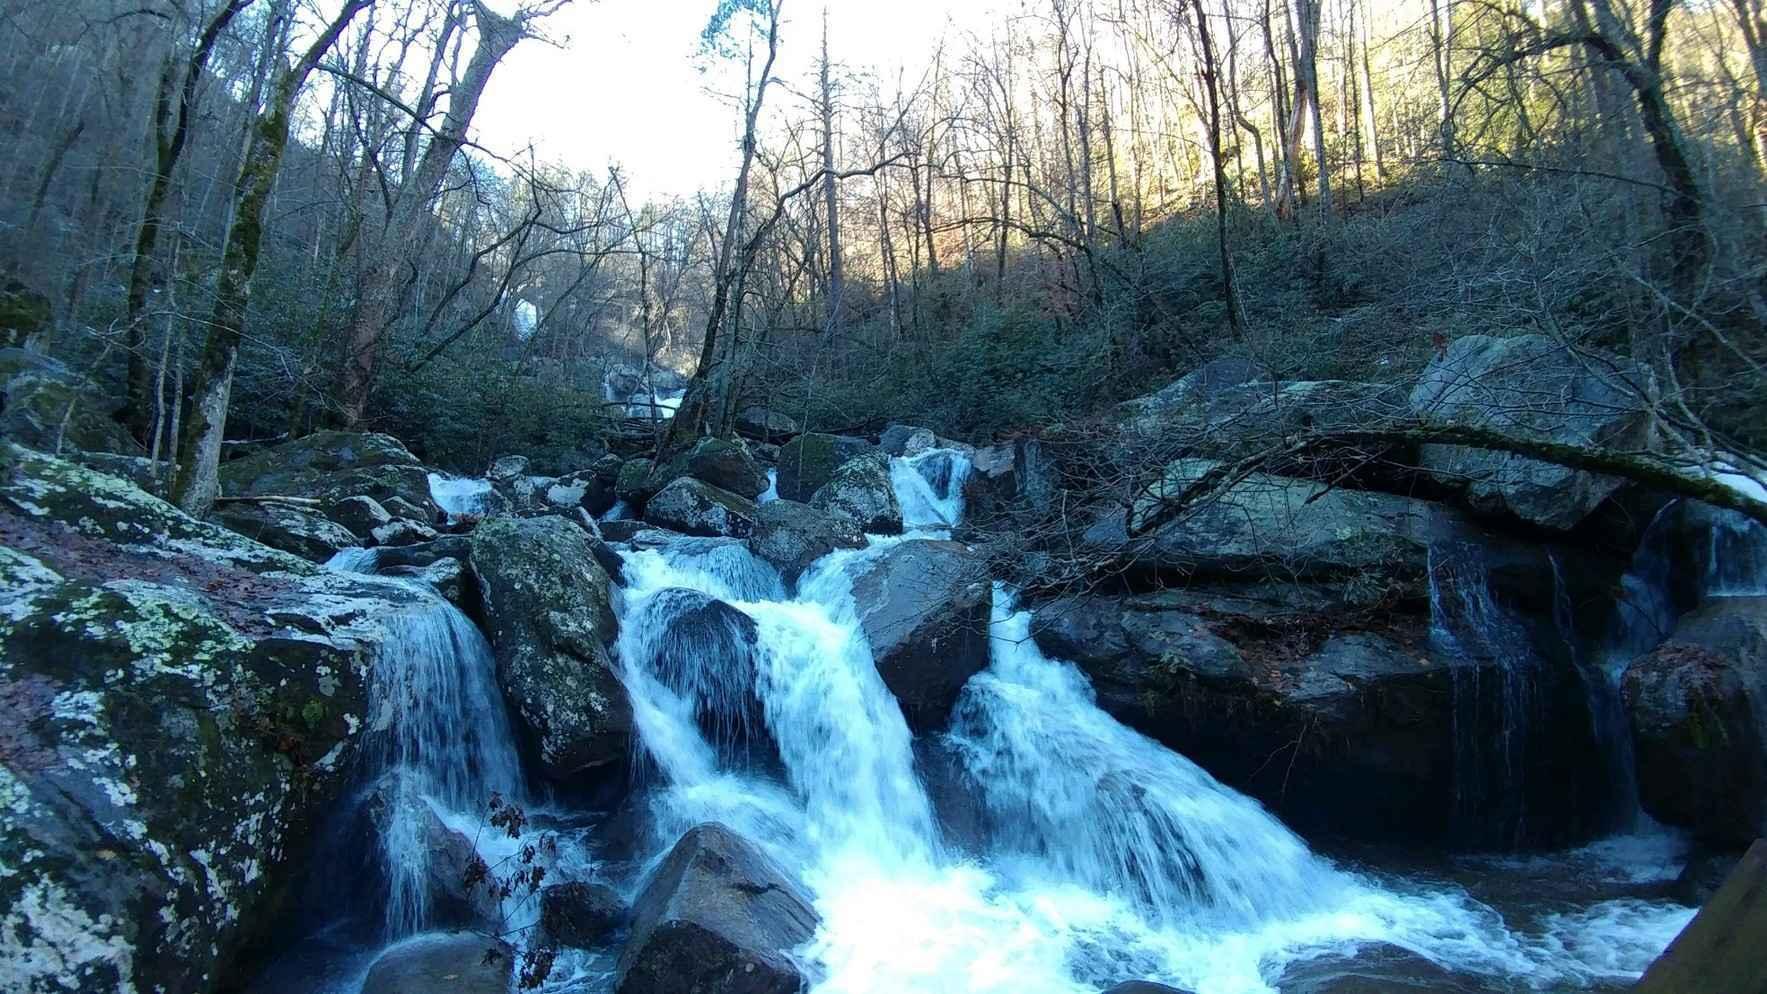 Eco-Tour | South Mountains State Park | Mar. 7, 2020 image